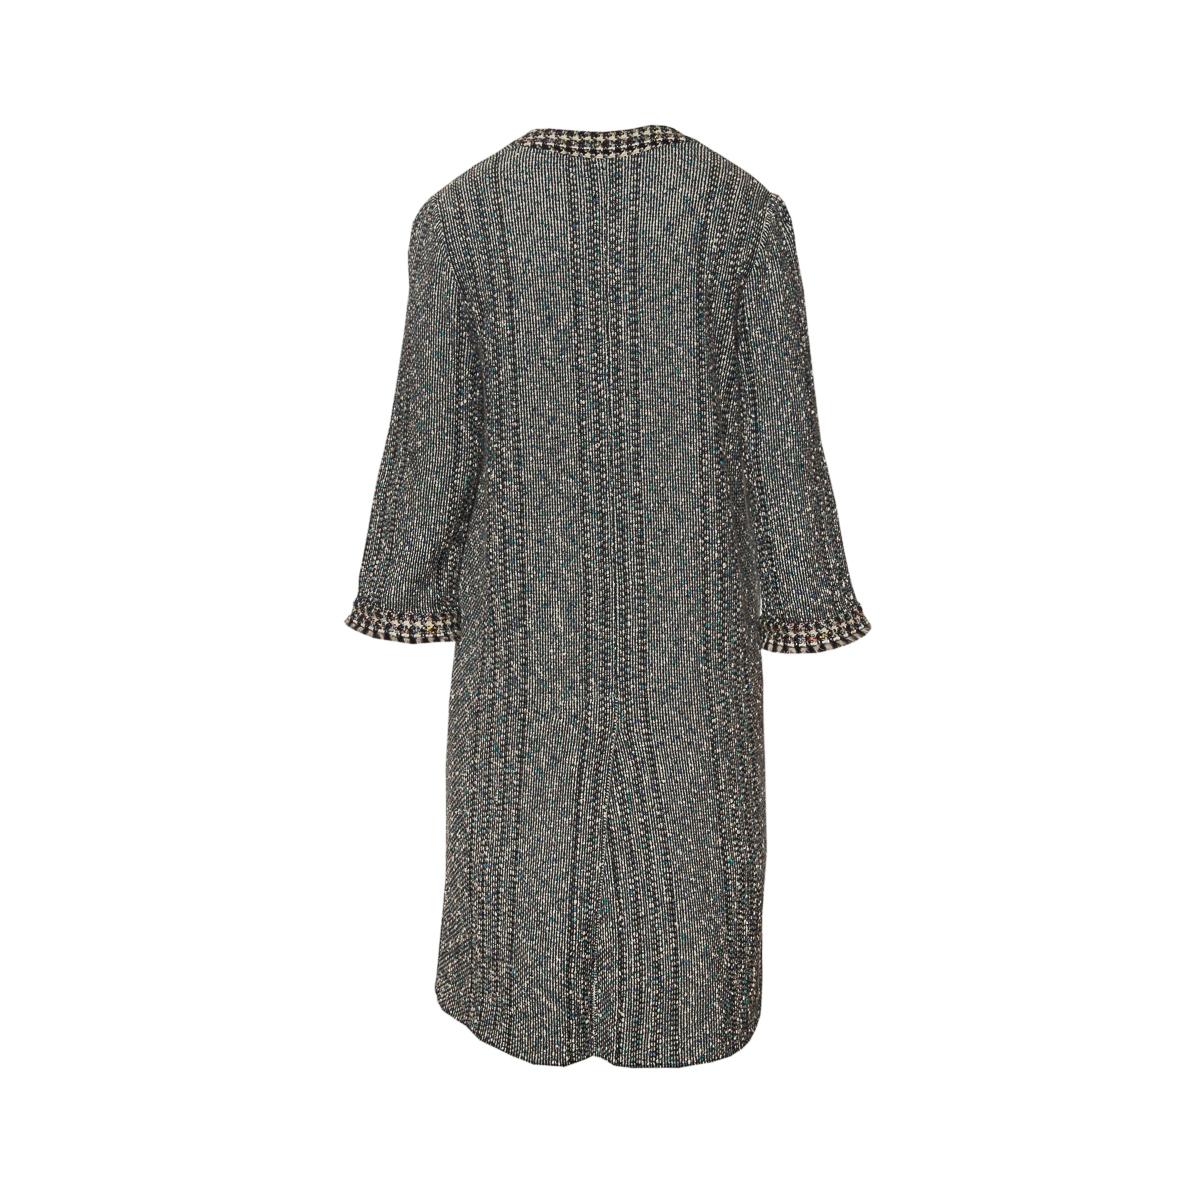 Легкое пальто из твида от Chanel, 42 размер.